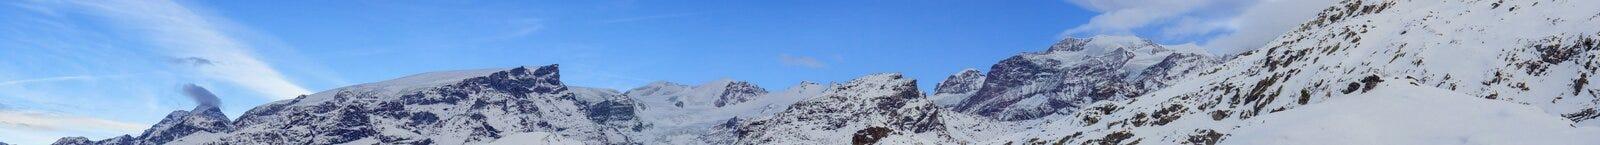 Dufourspitze και Matternhorn από Champoluc Στοκ εικόνες με δικαίωμα ελεύθερης χρήσης